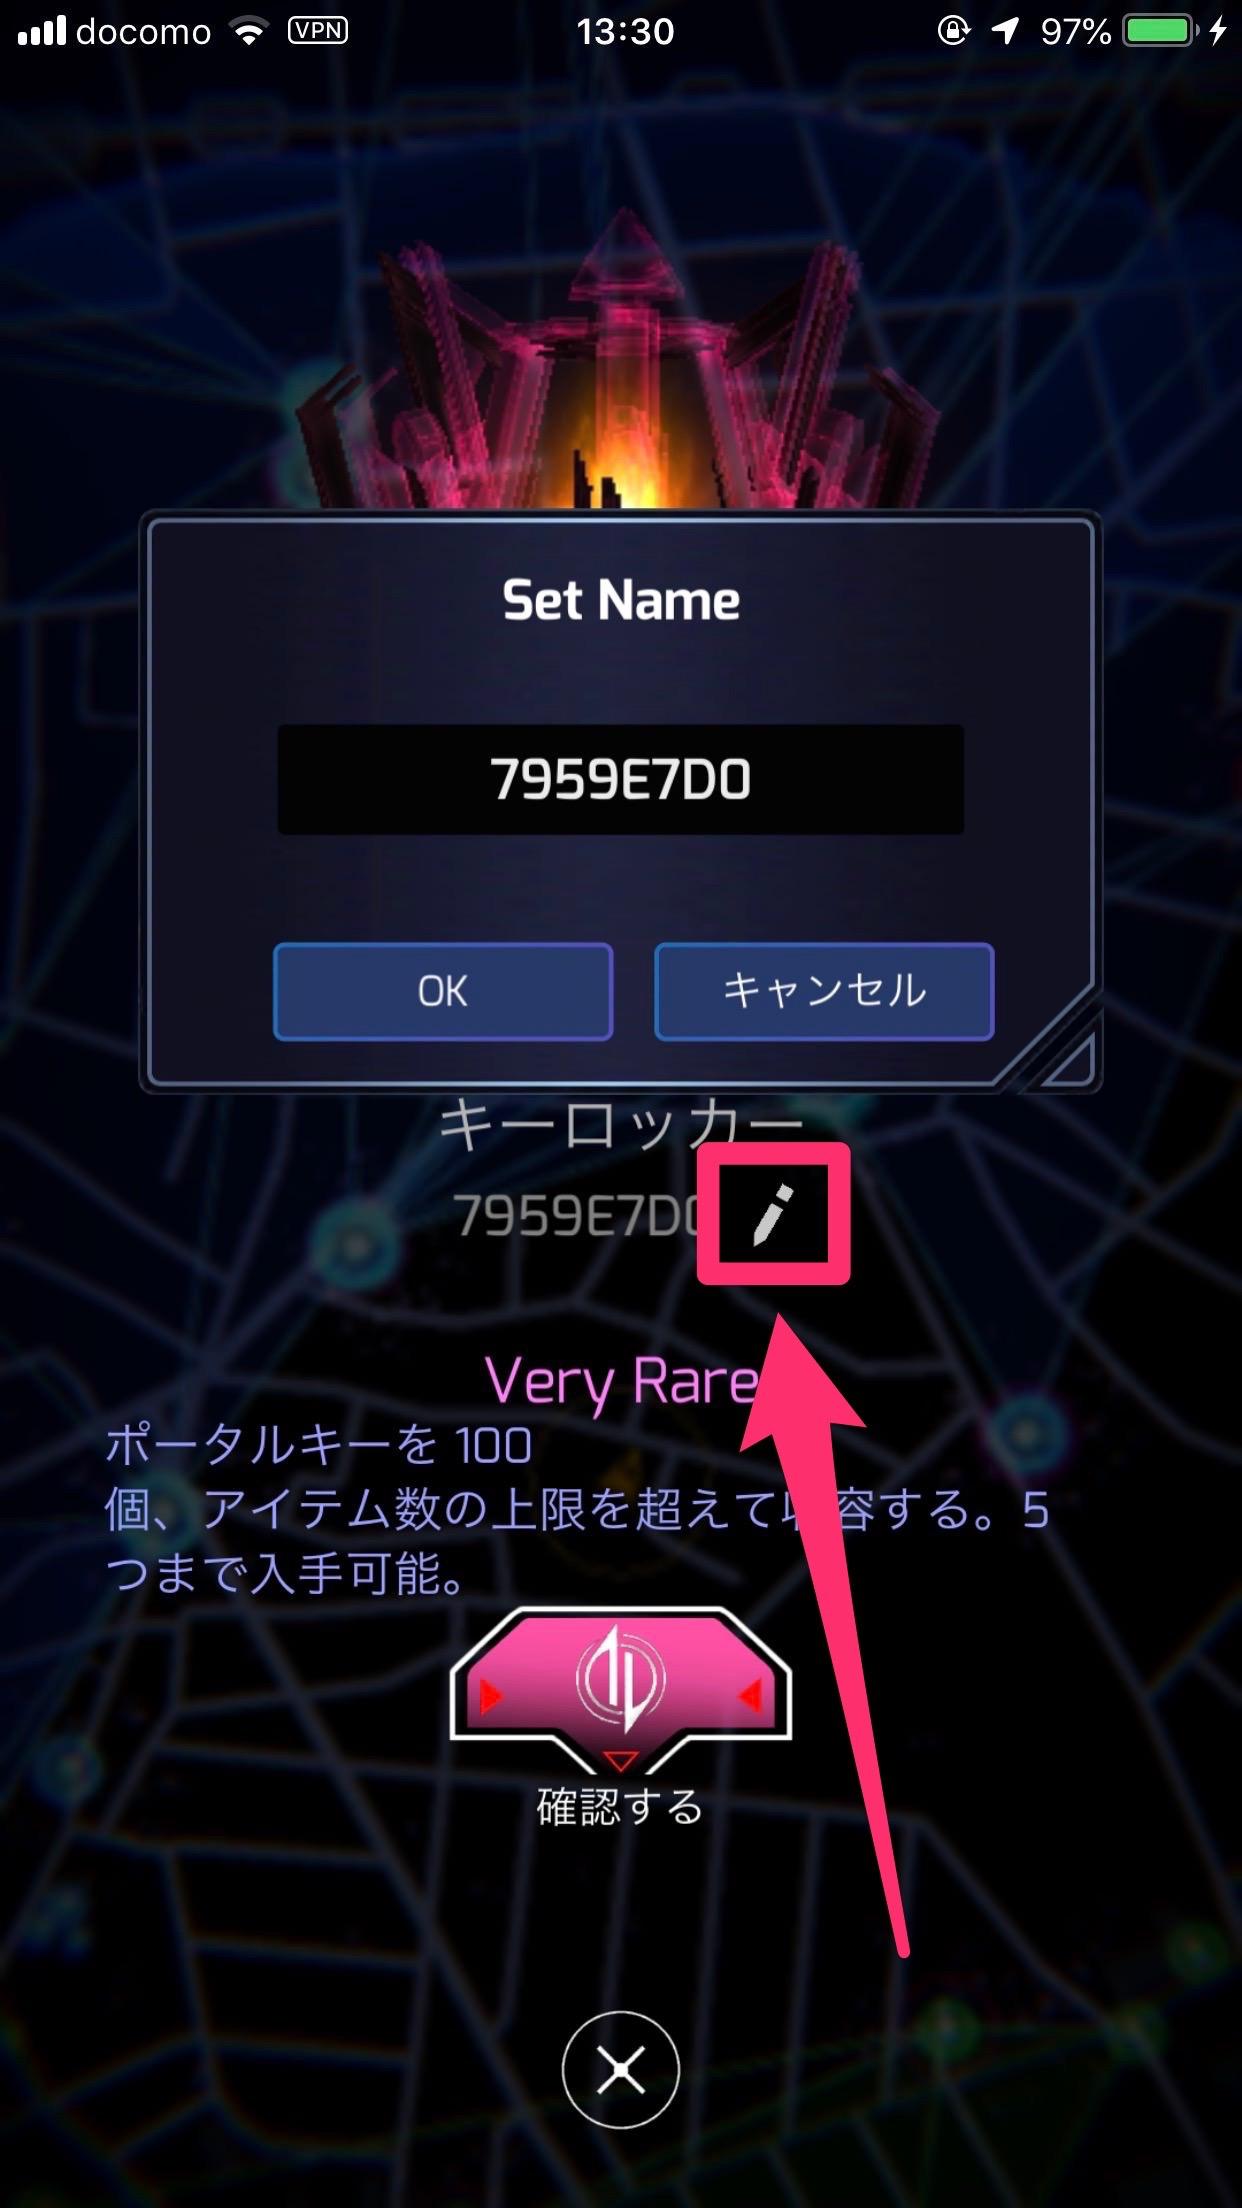 【Ingress】カプセル・クァンタムカプセル・キーロッカーの名称変更が可能に(リネーム機能)